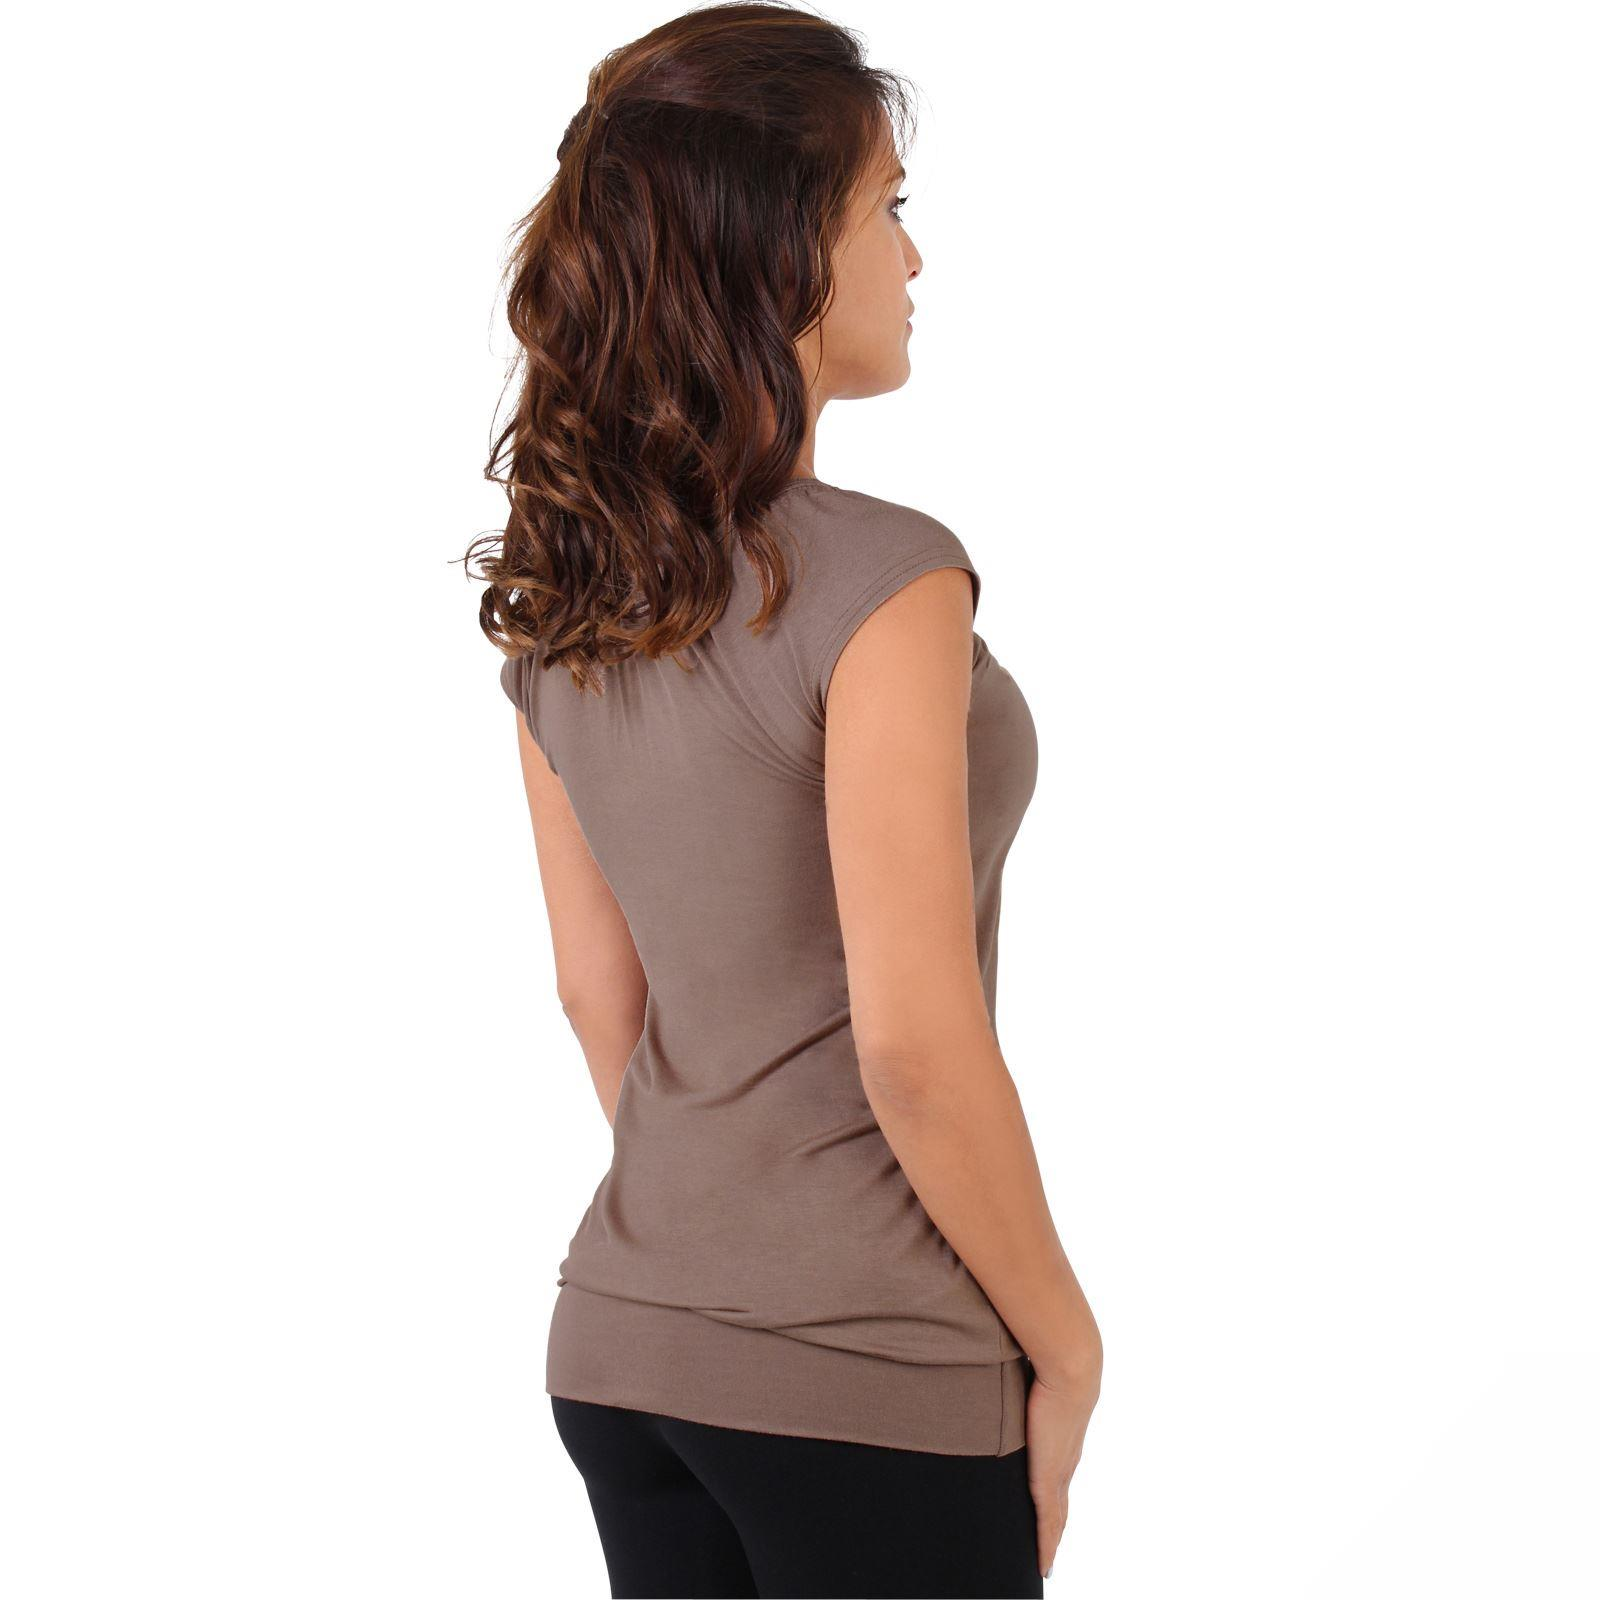 Womens-Ladies-Scoop-Neck-Blouse-V-T-Shirt-Long-Short-Sleeve-Plain-Loose-Top thumbnail 30